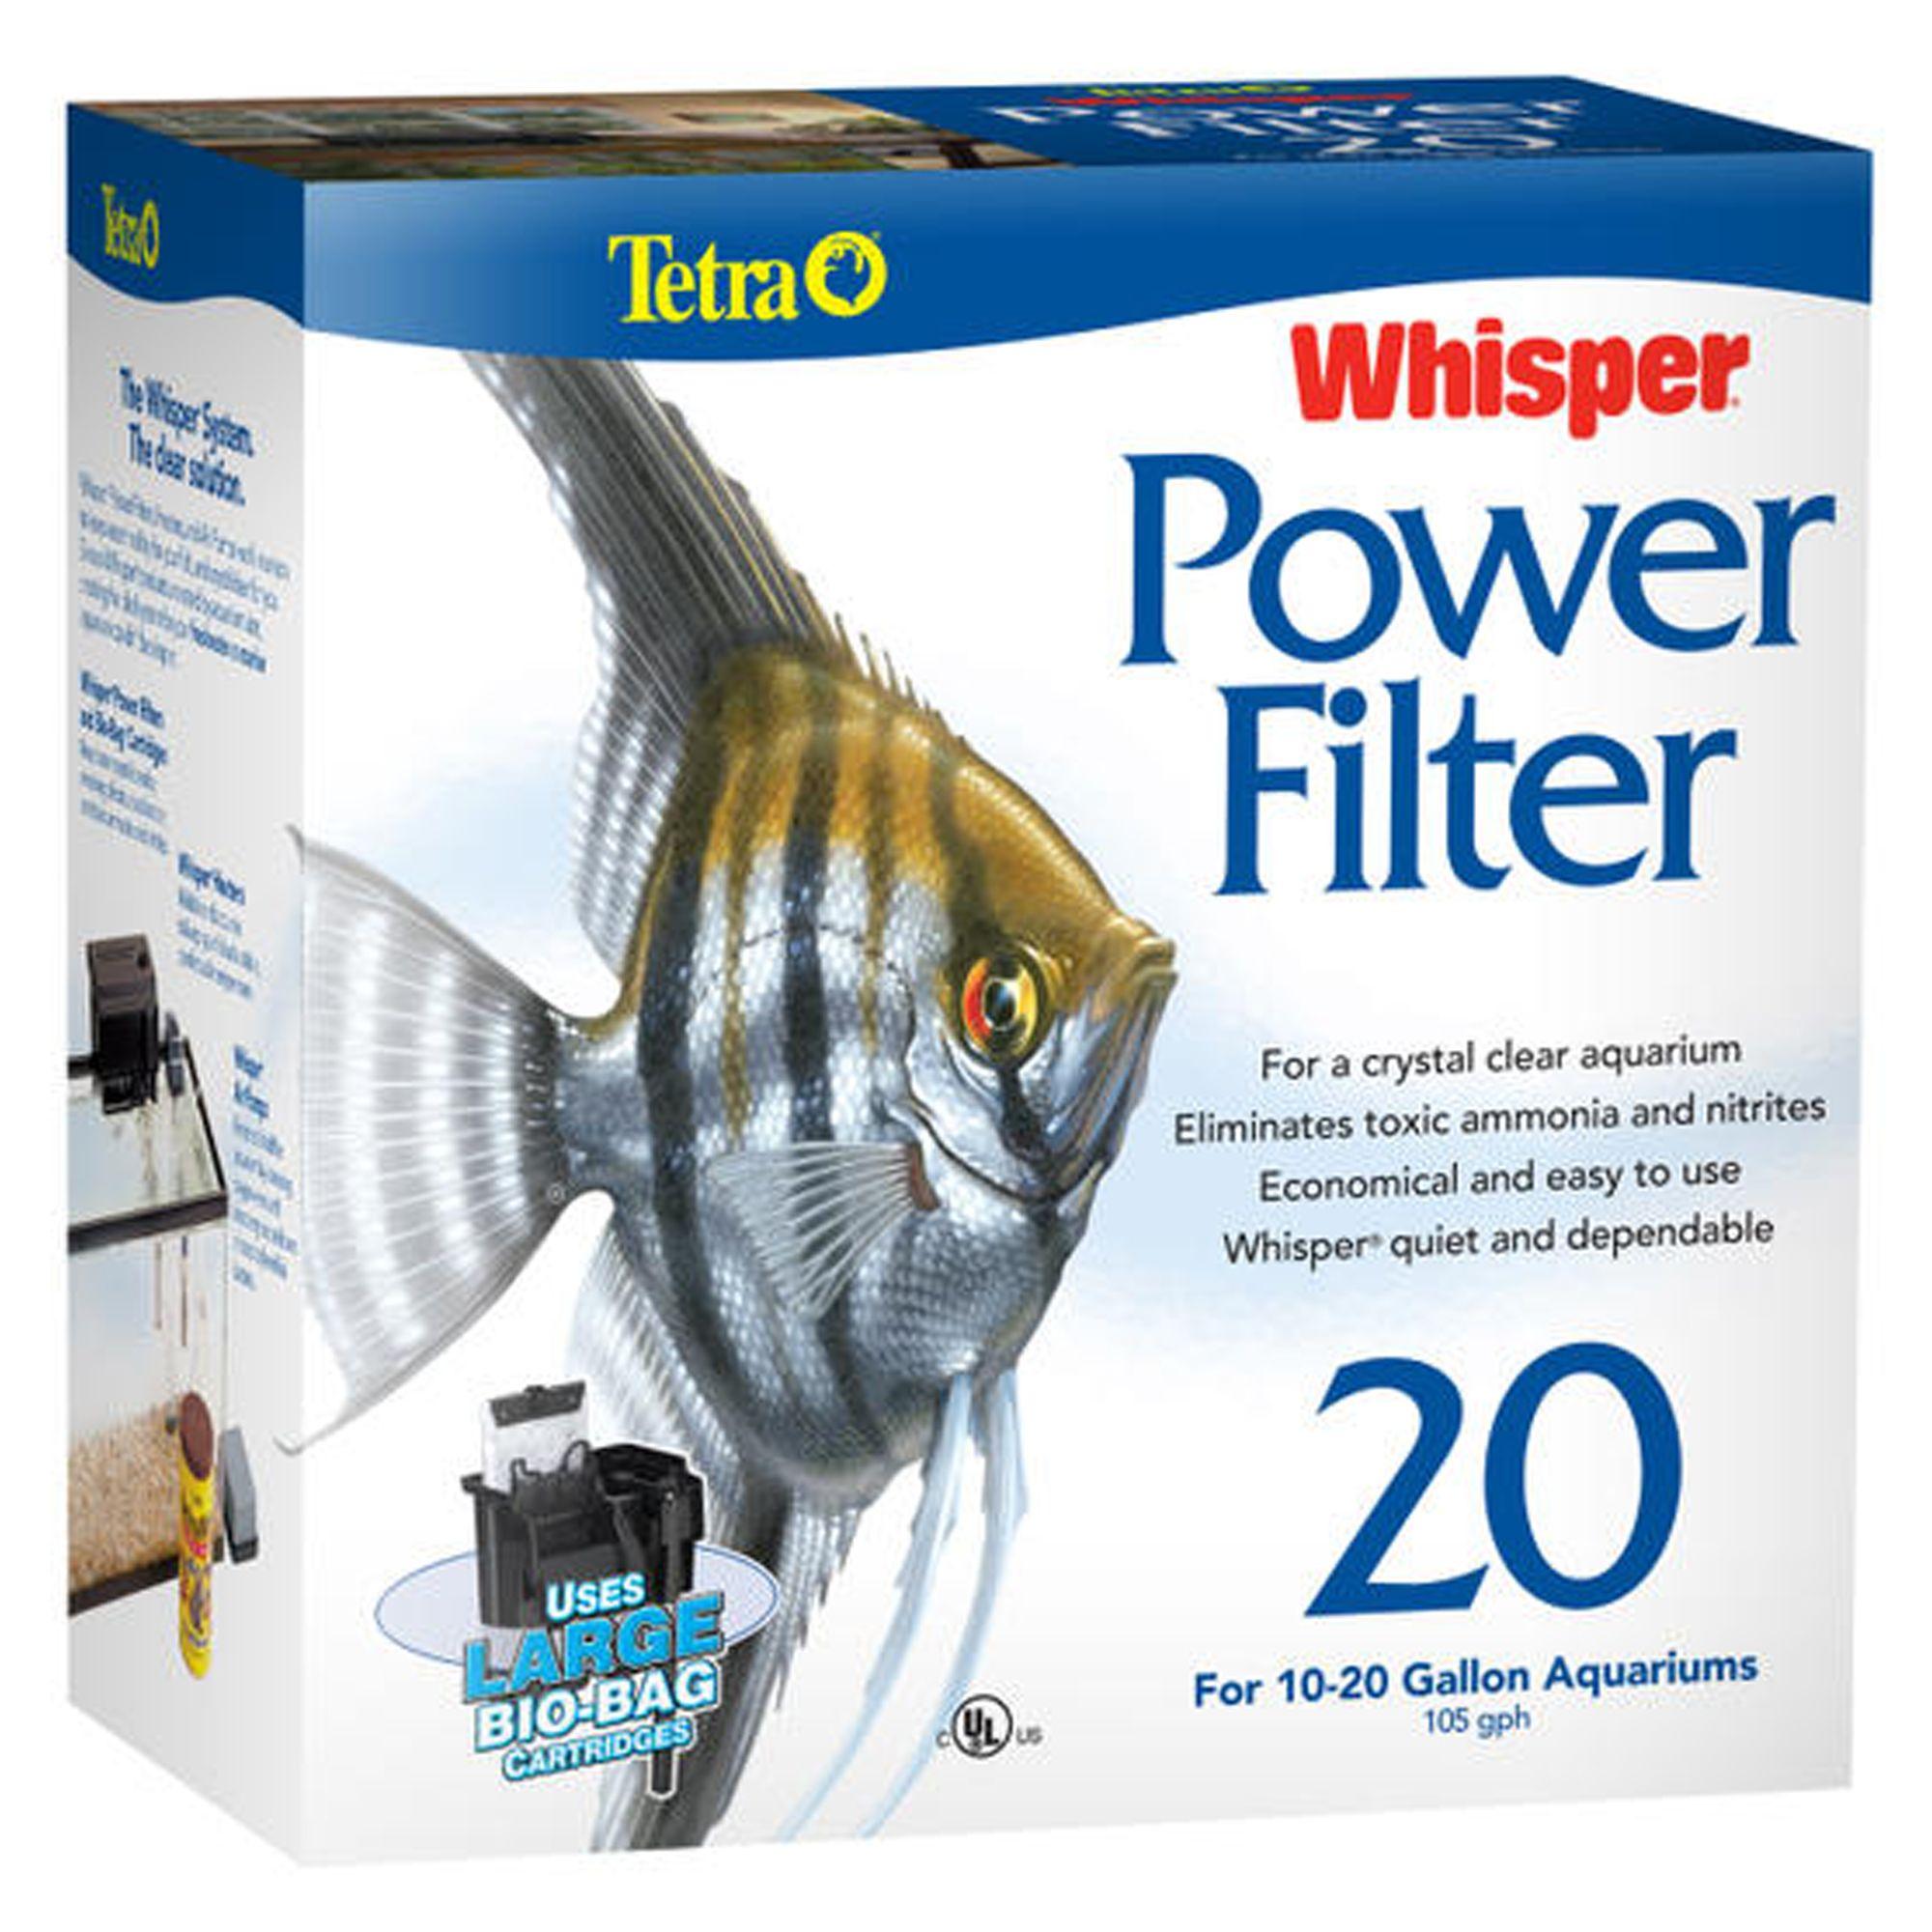 Tetra® Whisper Power Filter size: 20 Gal 1831624